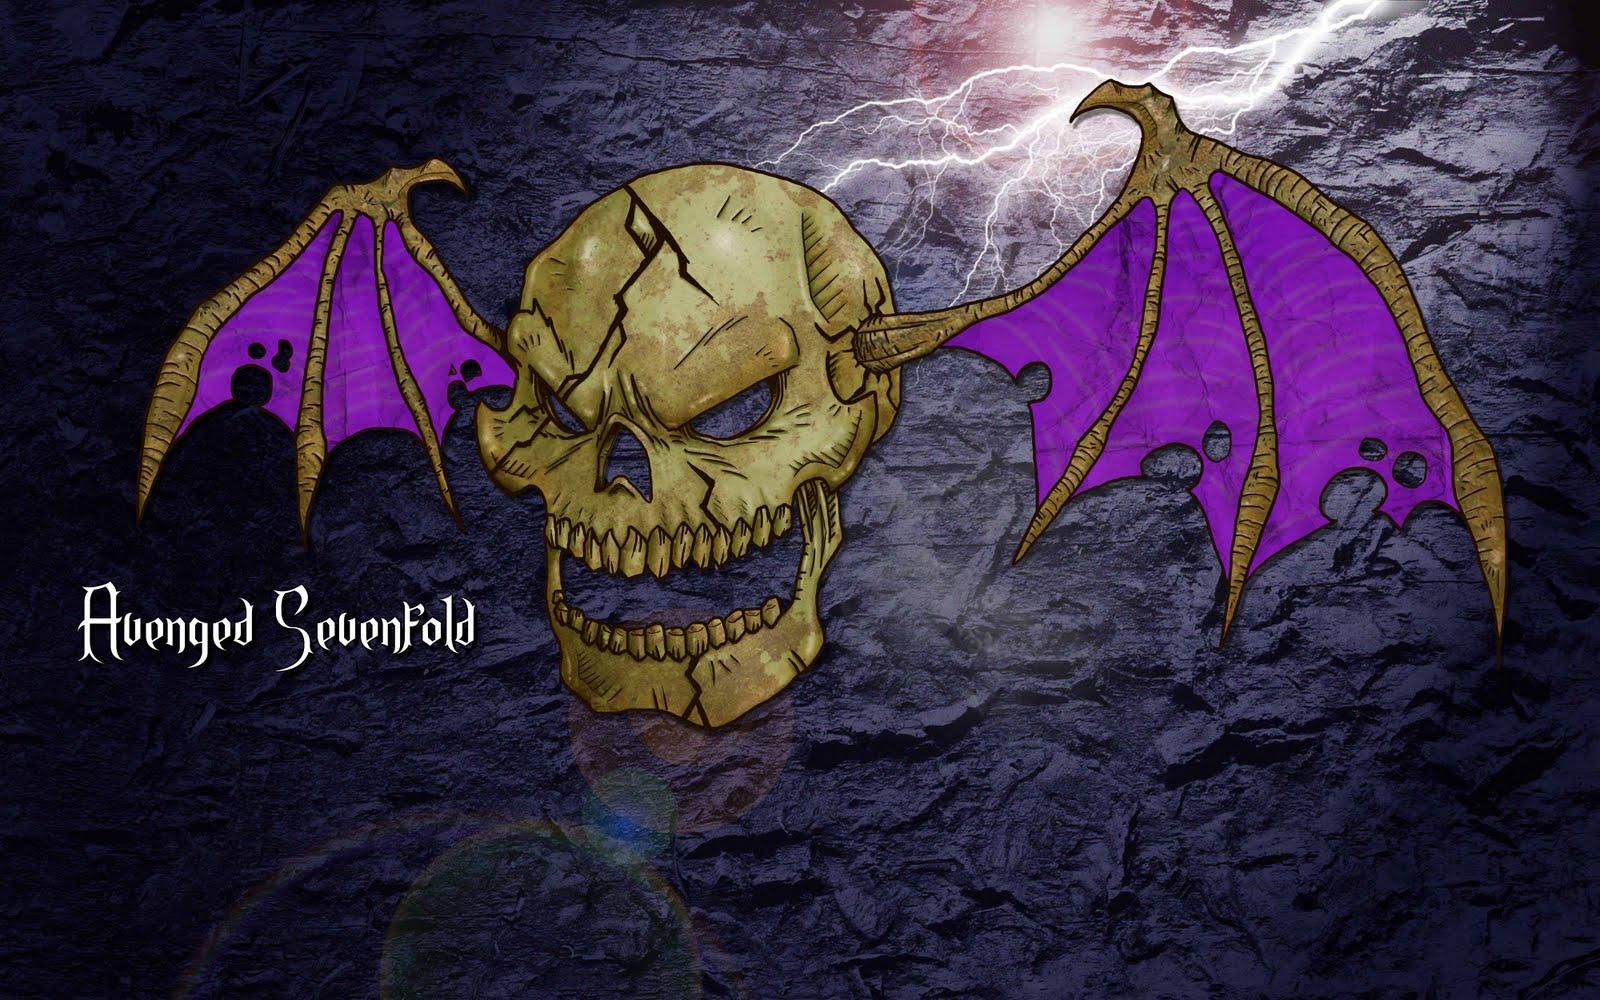 http://1.bp.blogspot.com/-wP0h88_eNaQ/TXmMKbmgqOI/AAAAAAAAAlw/GNGJ4WXbiVM/s1600/cavera%2BA7X%2BWallpaper.jpg